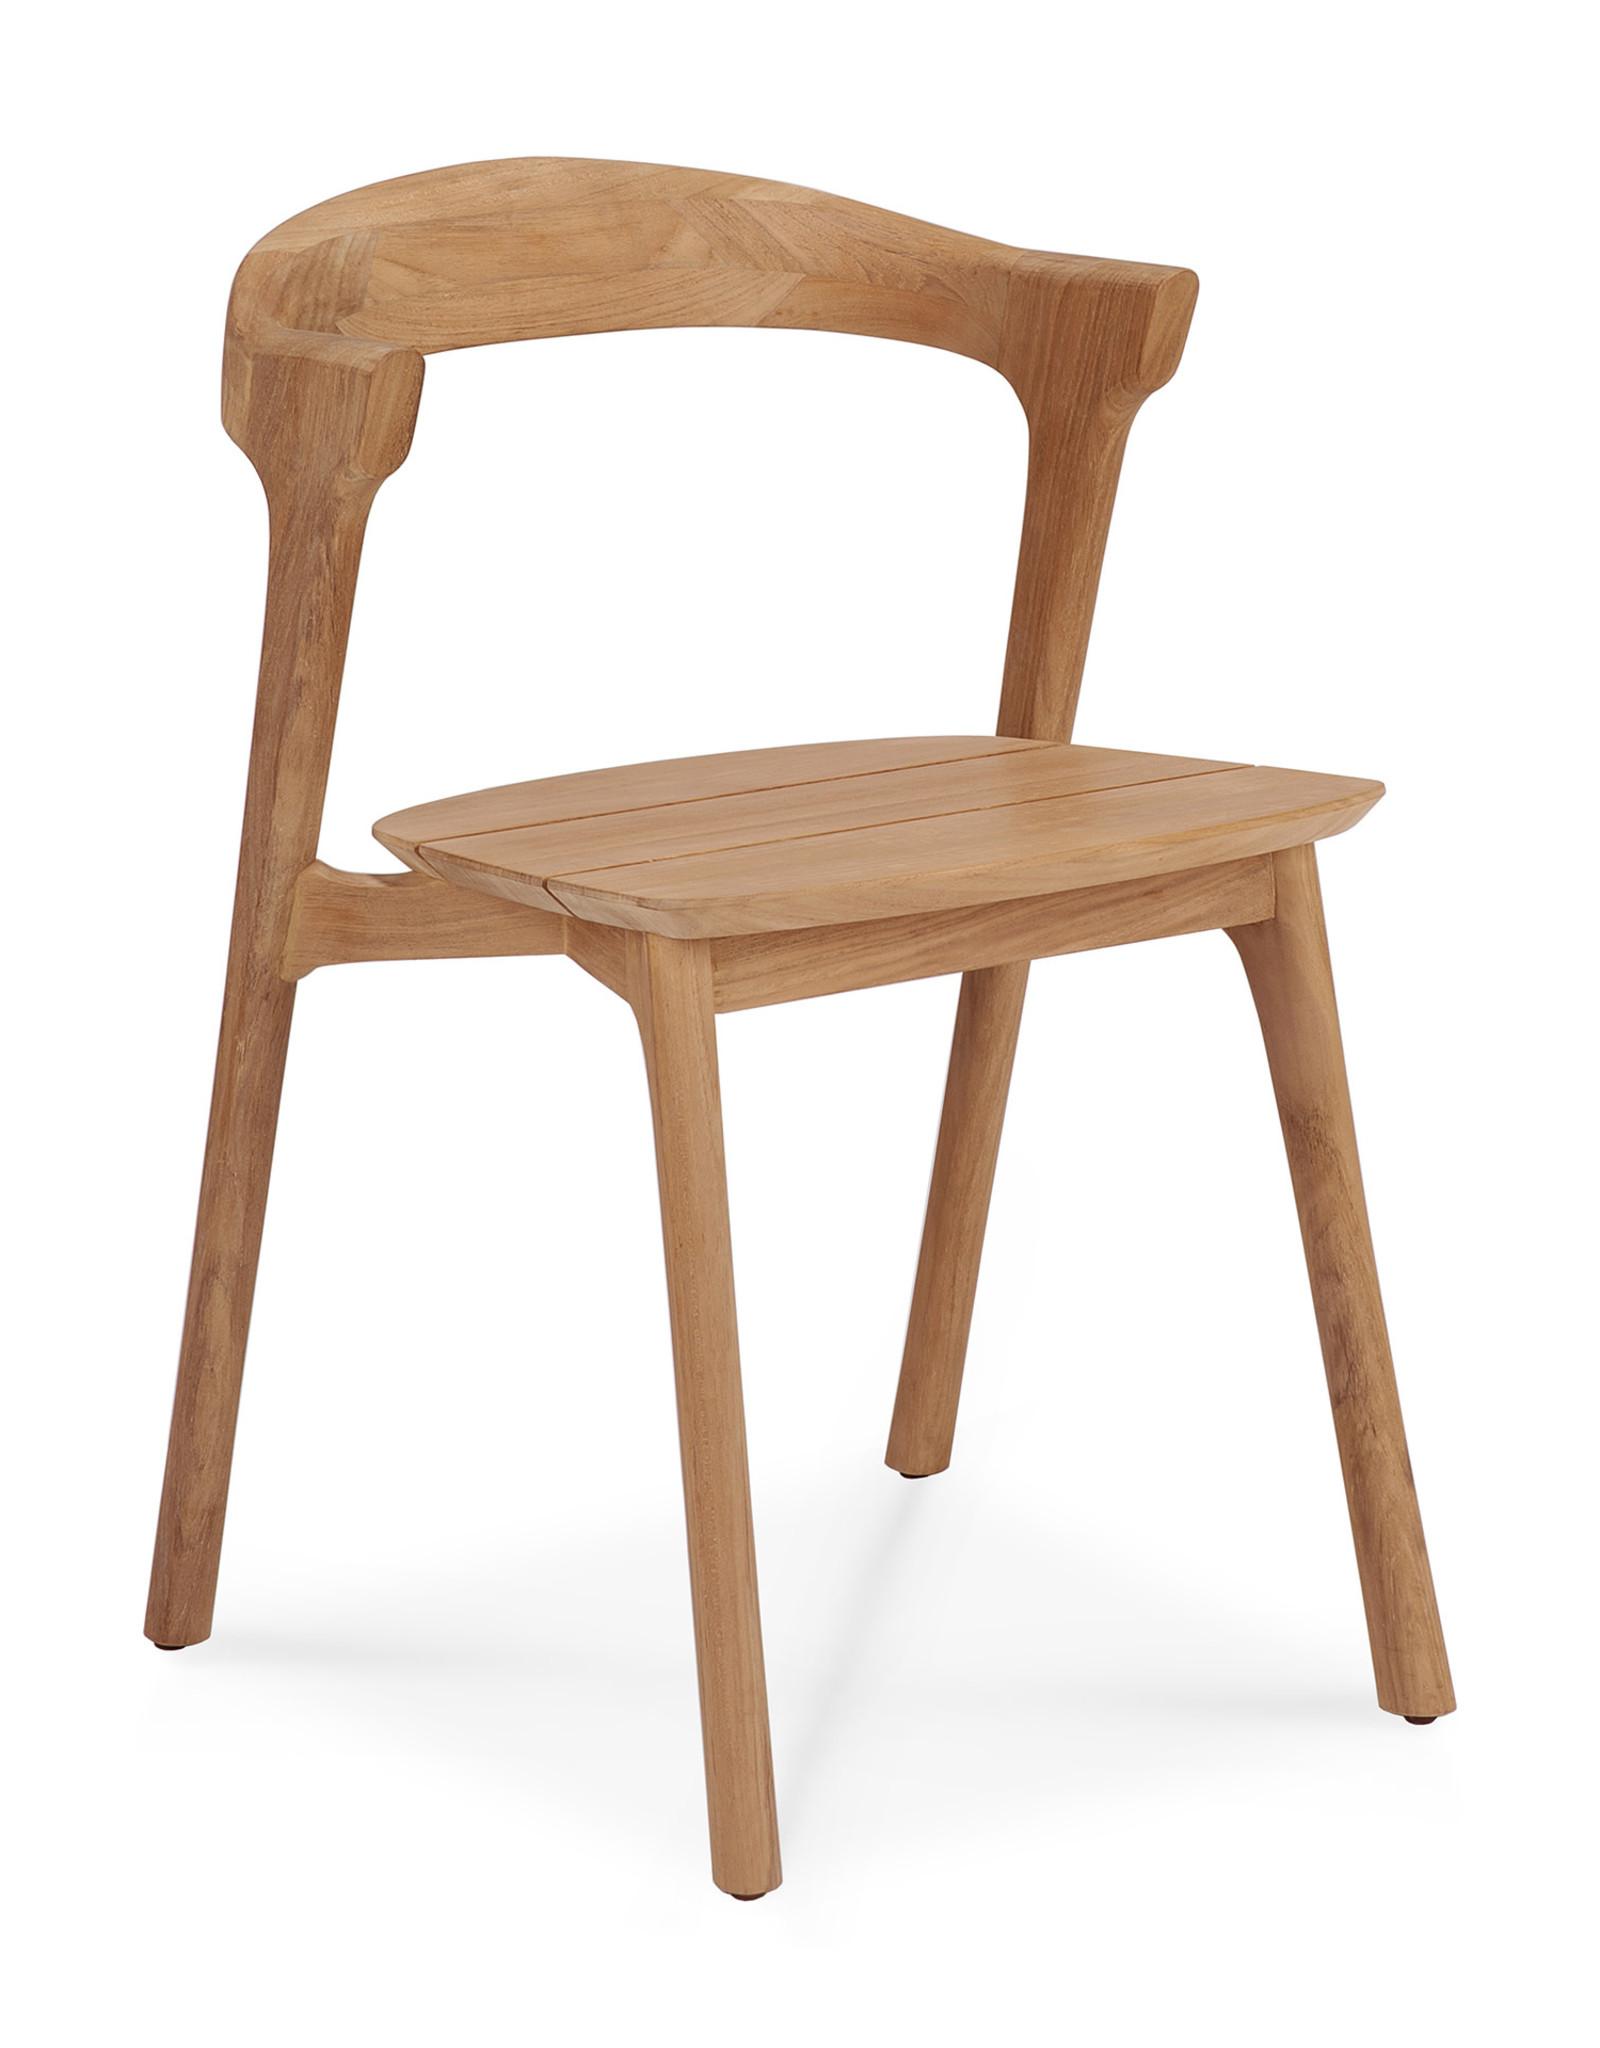 Teak Bok outdoor dining chair